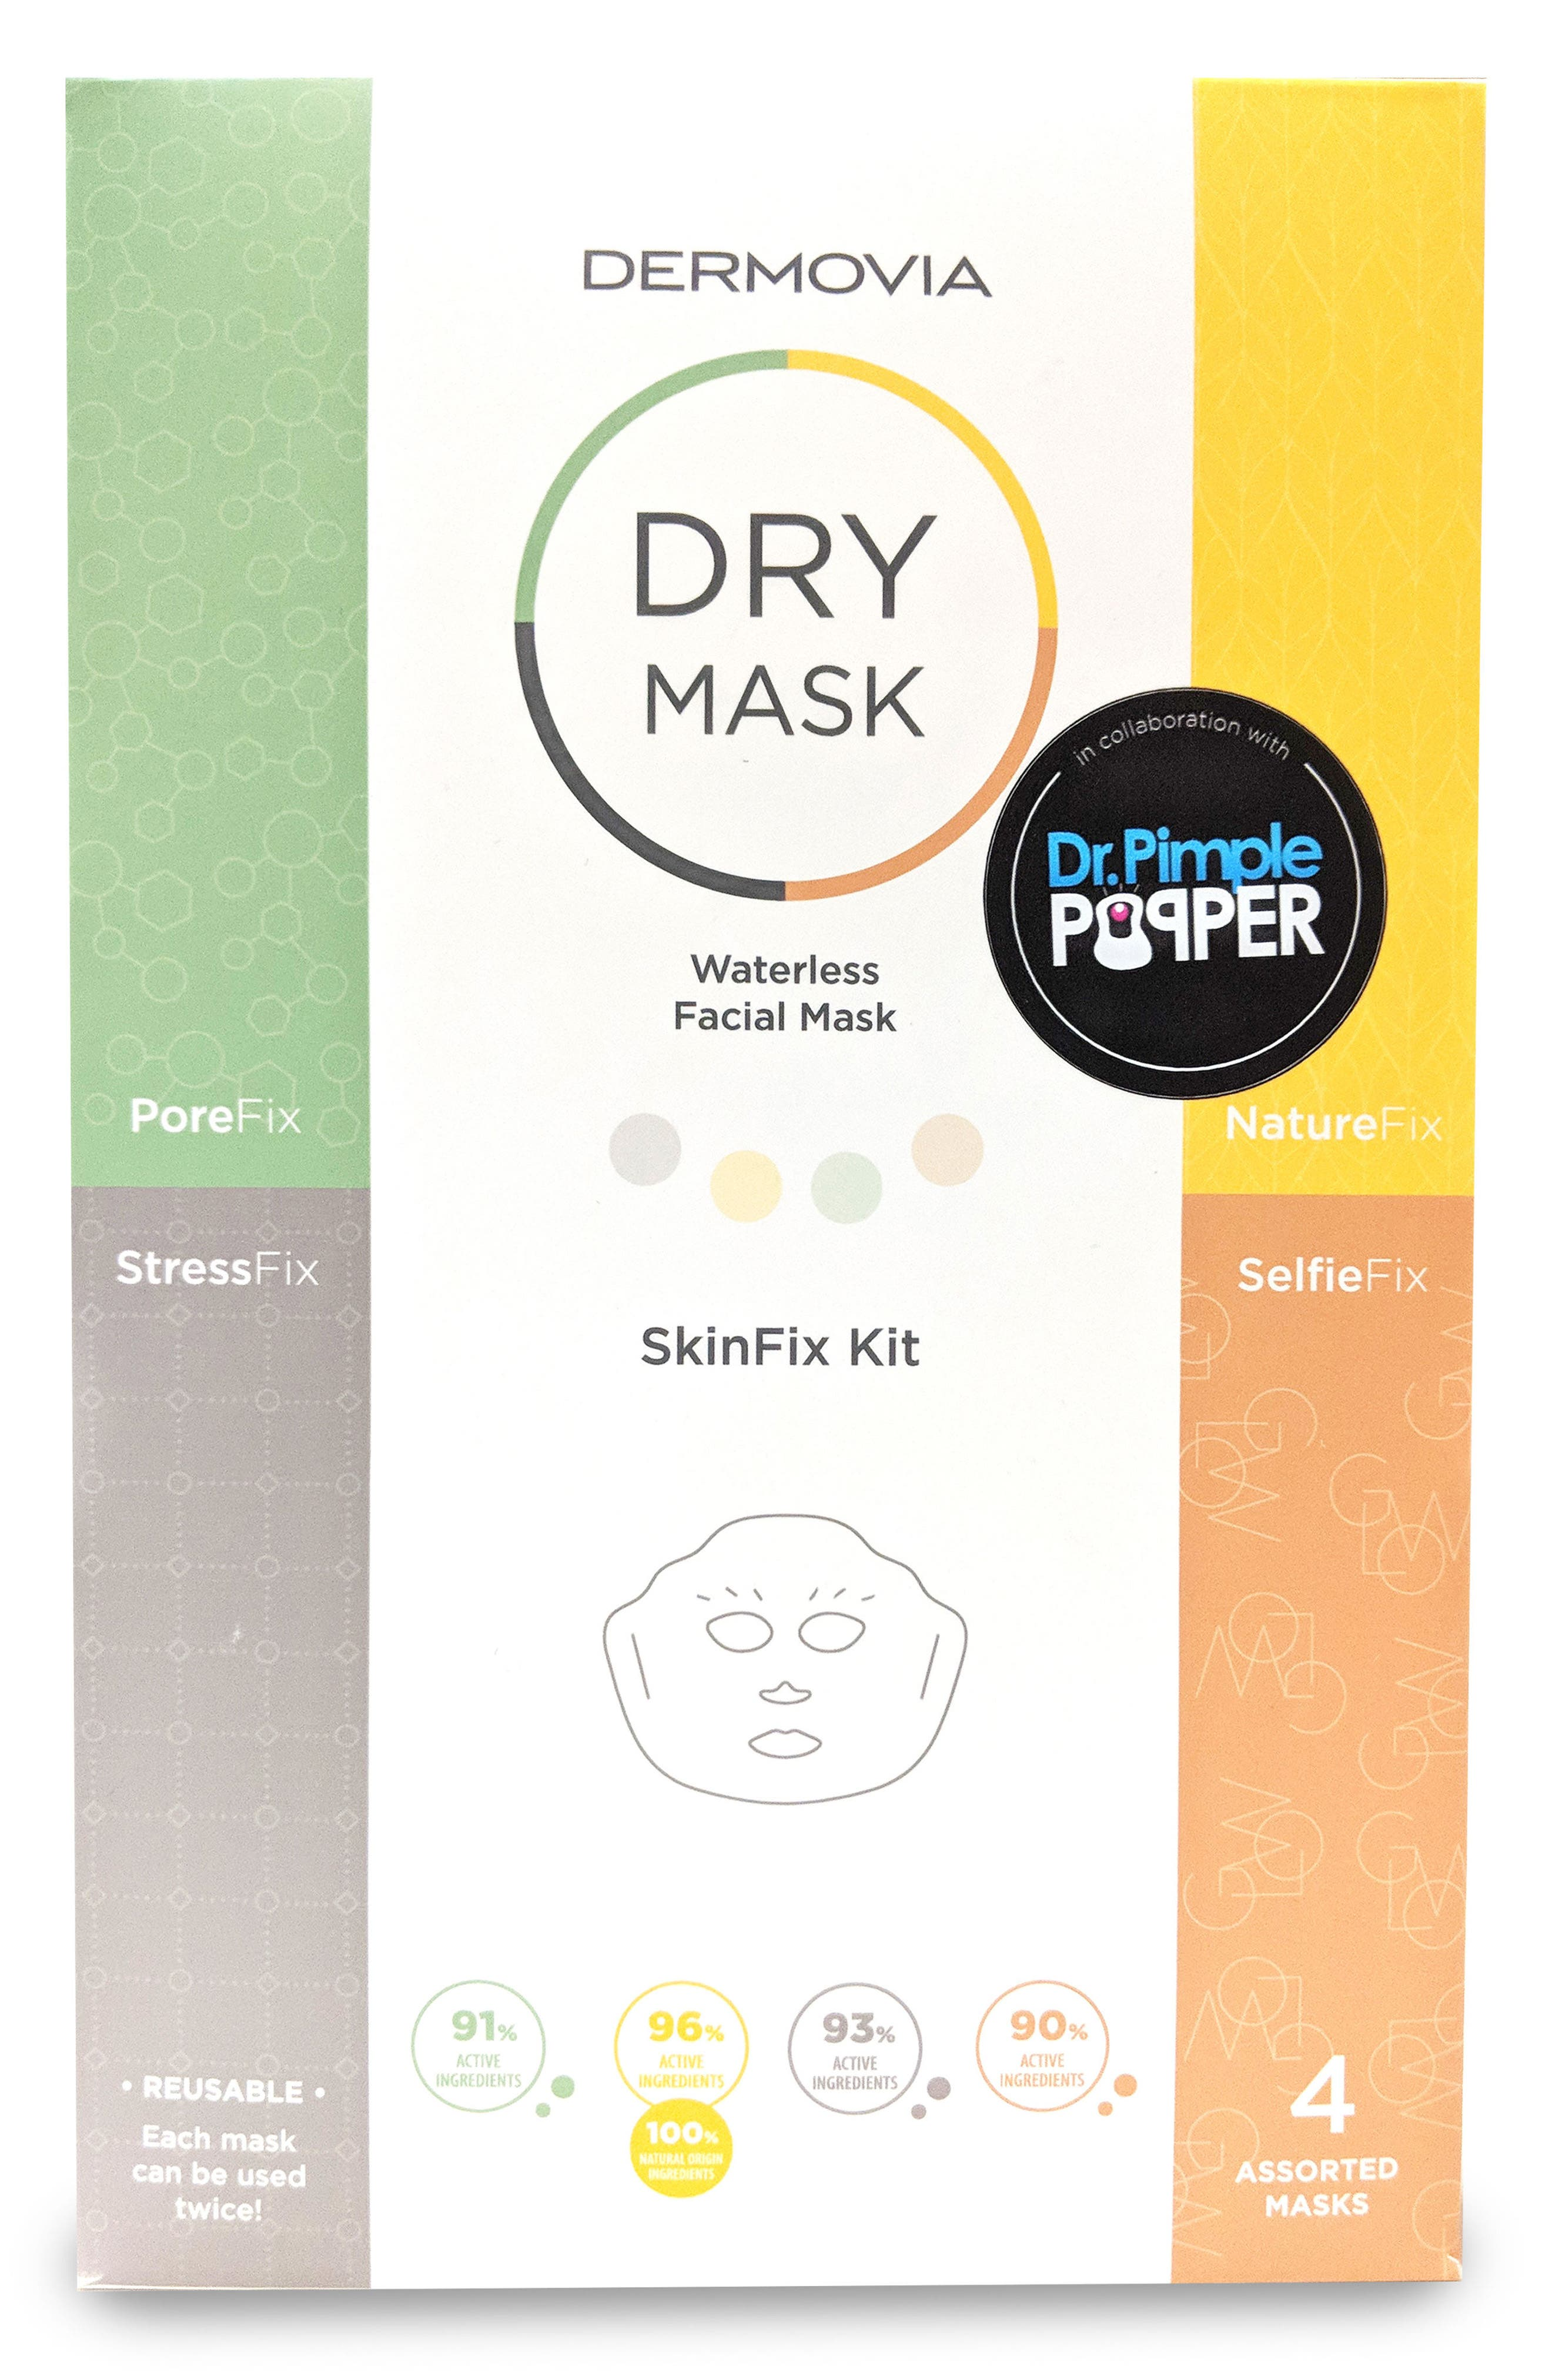 x Dr. Pimple Popper DRY Mask Waterless Facial Mask SkinFix Kit,                             Main thumbnail 1, color,                             000